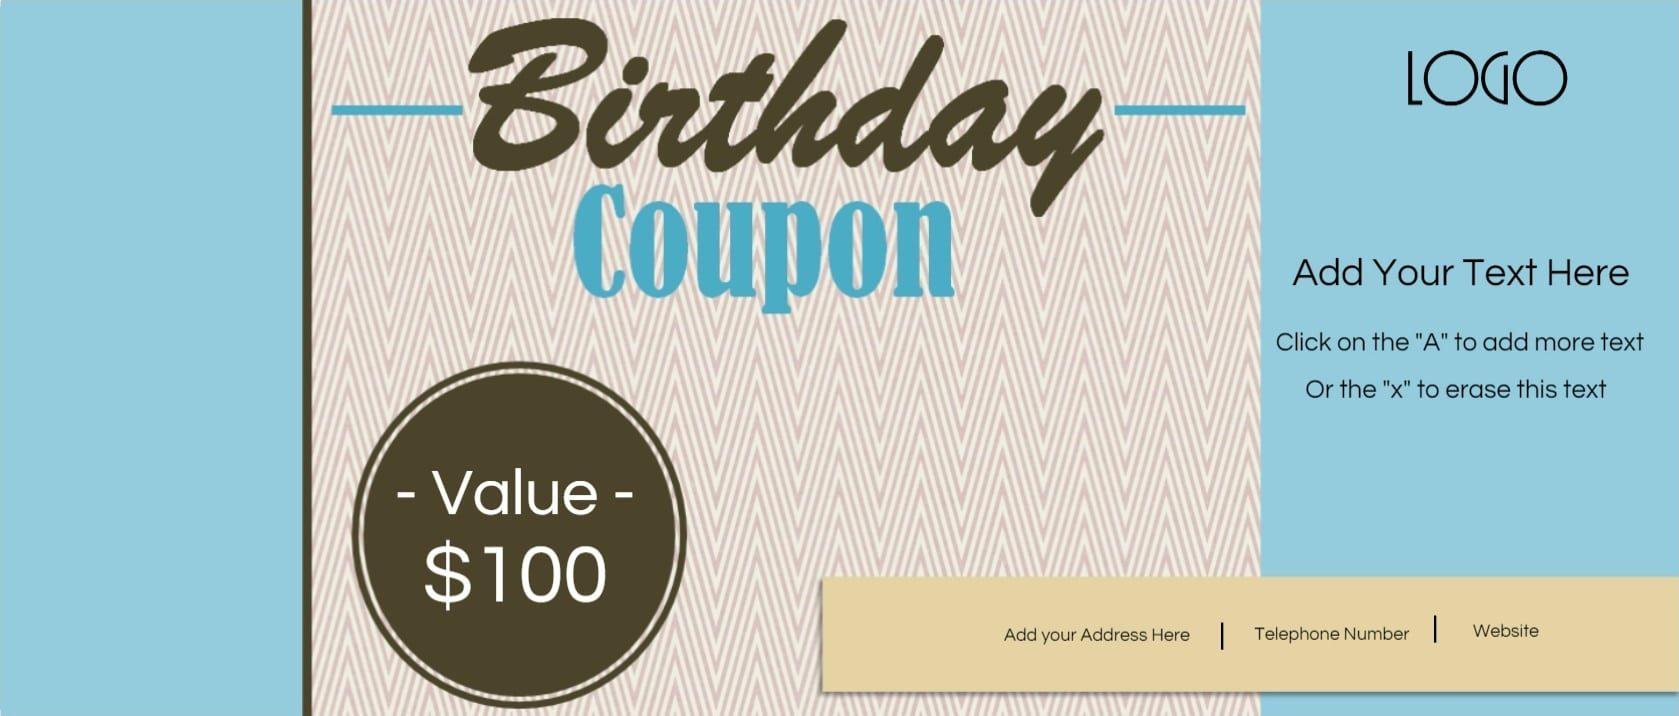 Printable Coupon Book Template | Flogfolioweekly Free Pics - Free Printable Blank Birthday Coupons